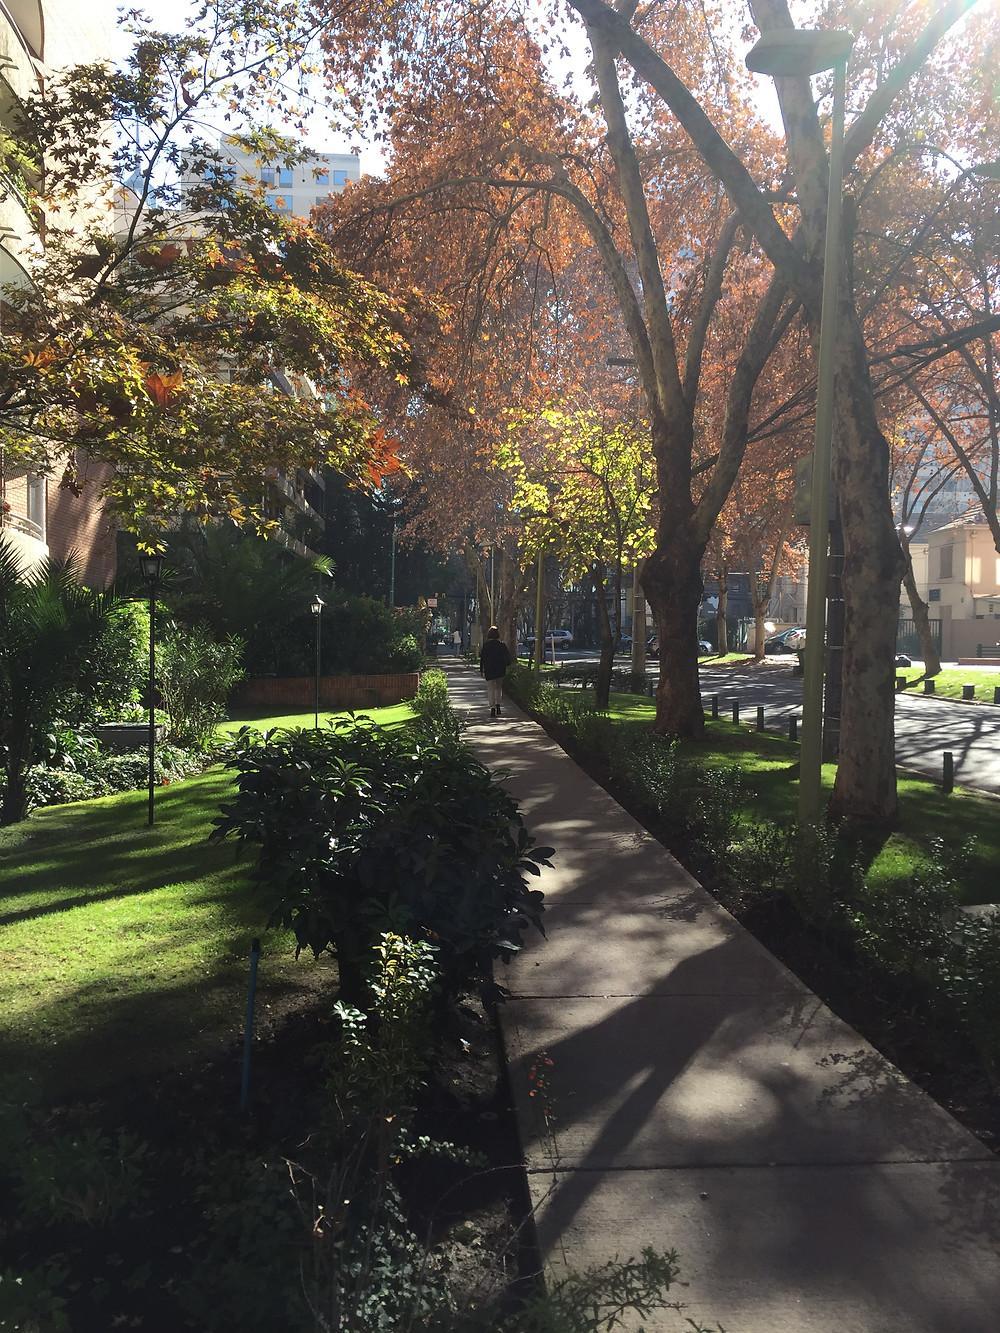 Tree lined street in downtown Santiago